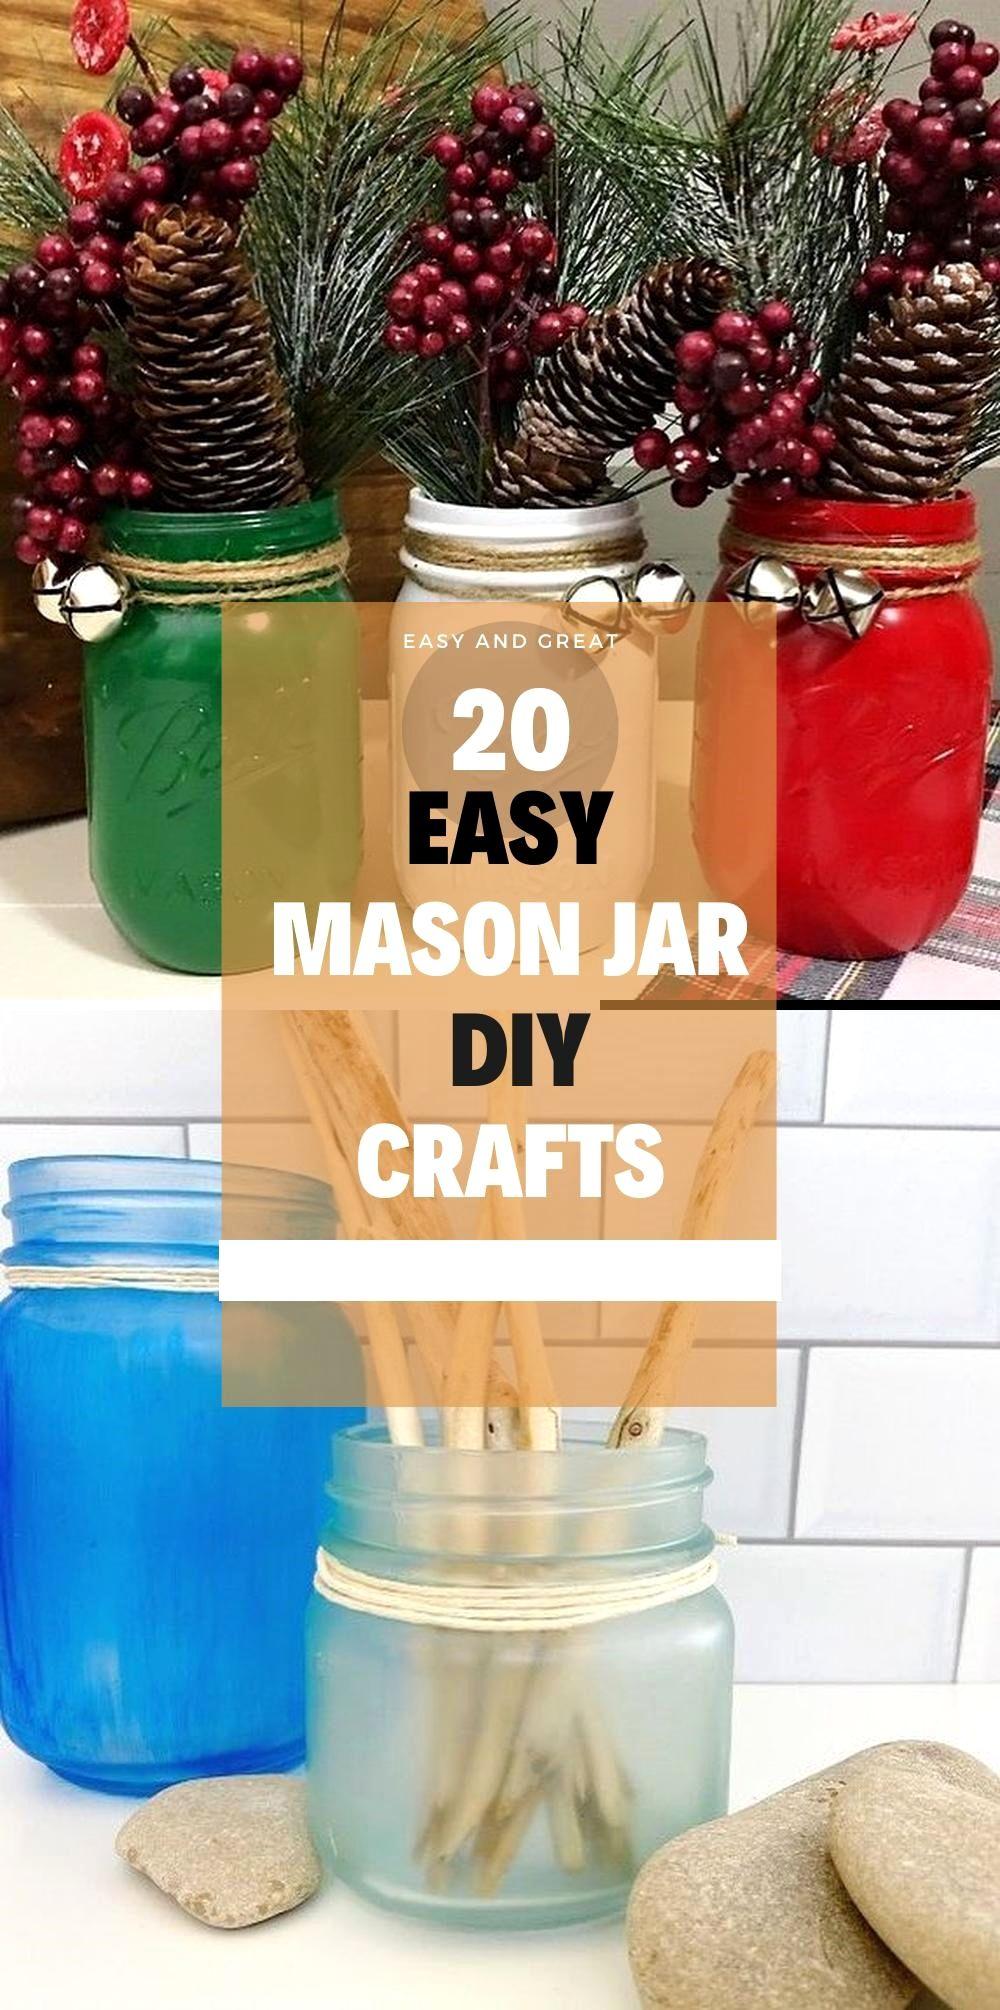 Photo of Easy & Creative DIY Mason Jar crafts